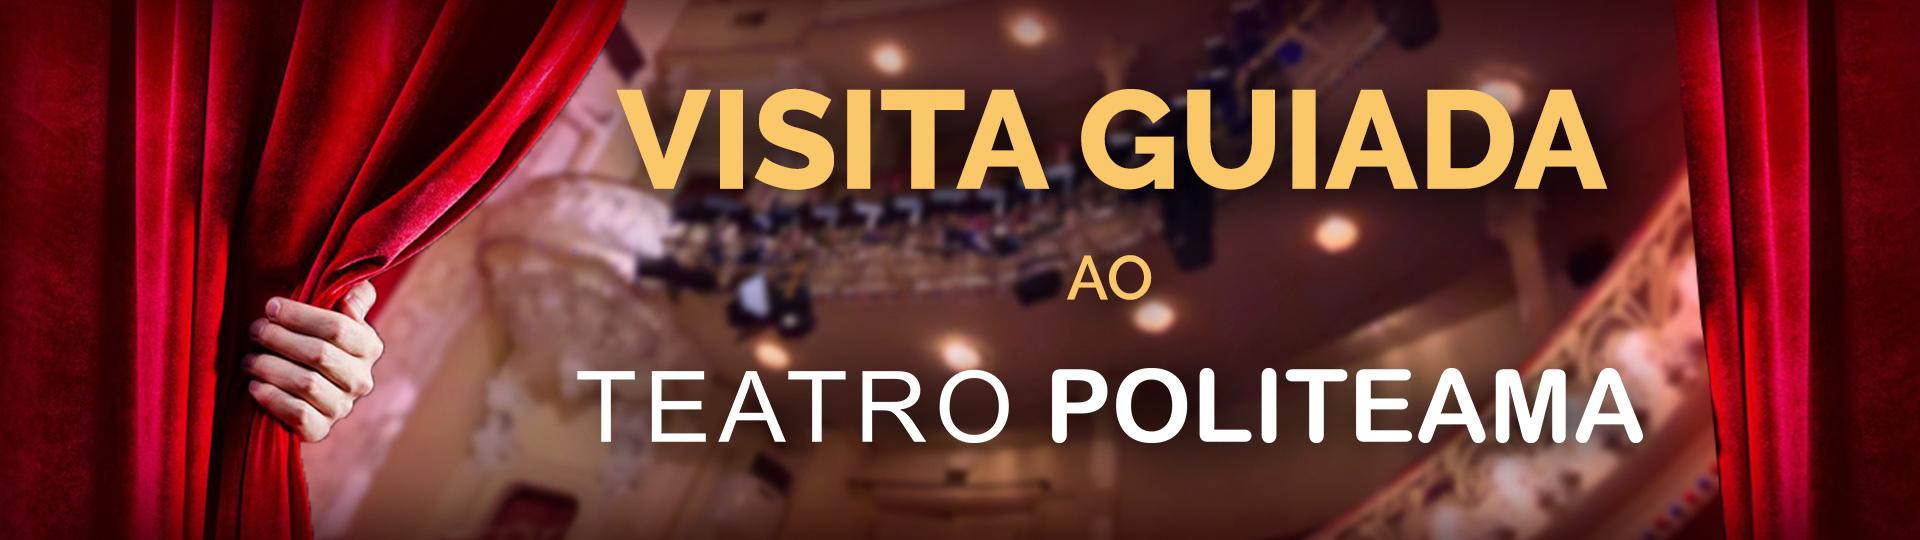 VISITA GUIADA TEATRO POLITEAMA